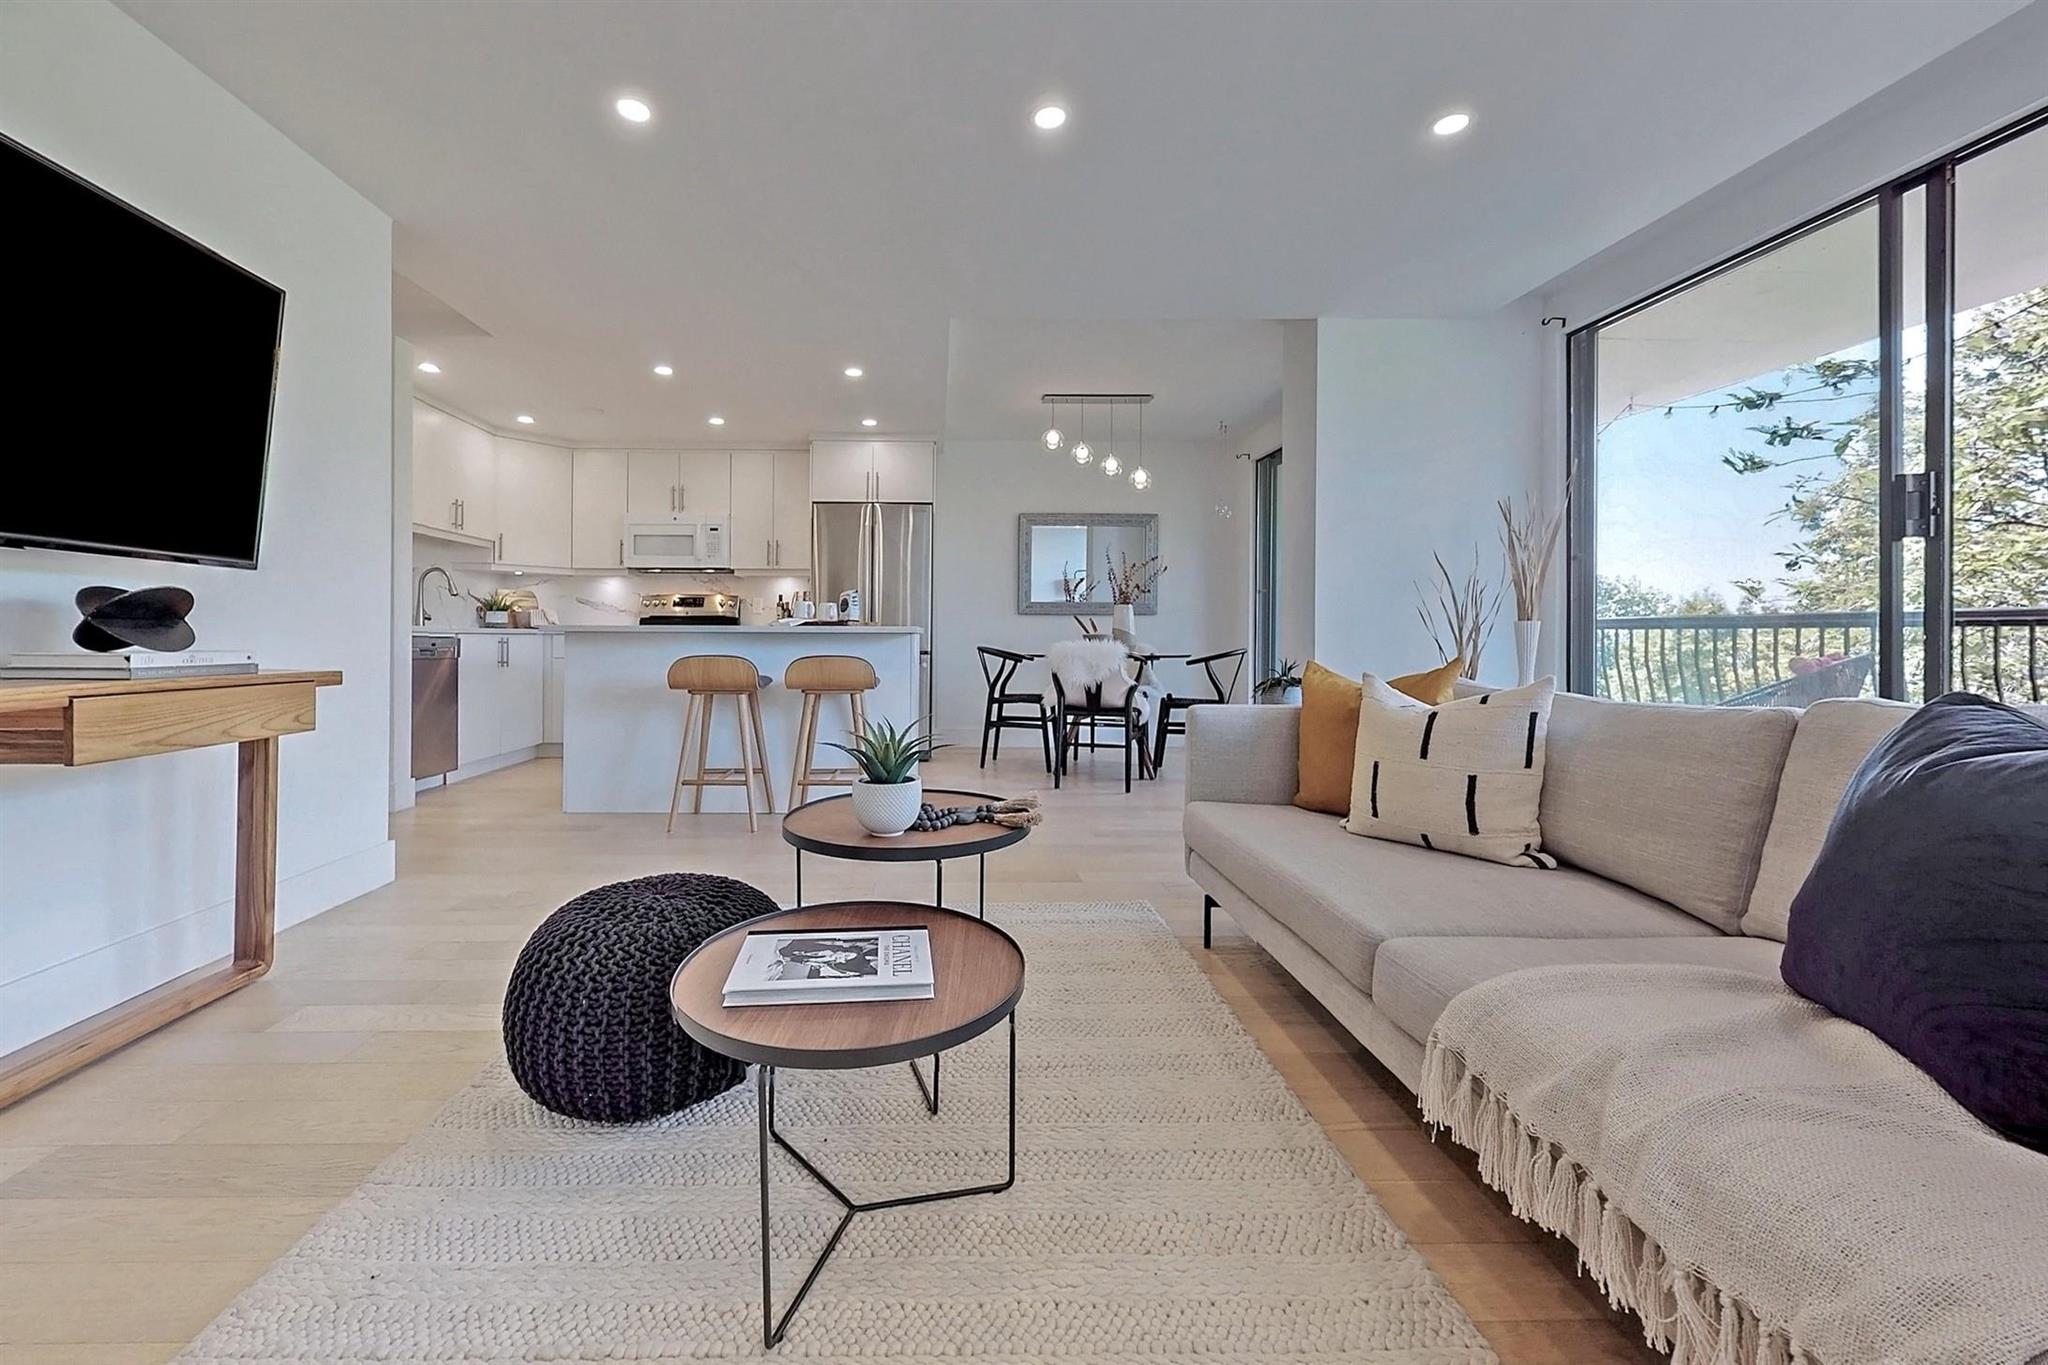 305 701 W VICTORIA PARK - Central Lonsdale Apartment/Condo for sale, 2 Bedrooms (R2602931)